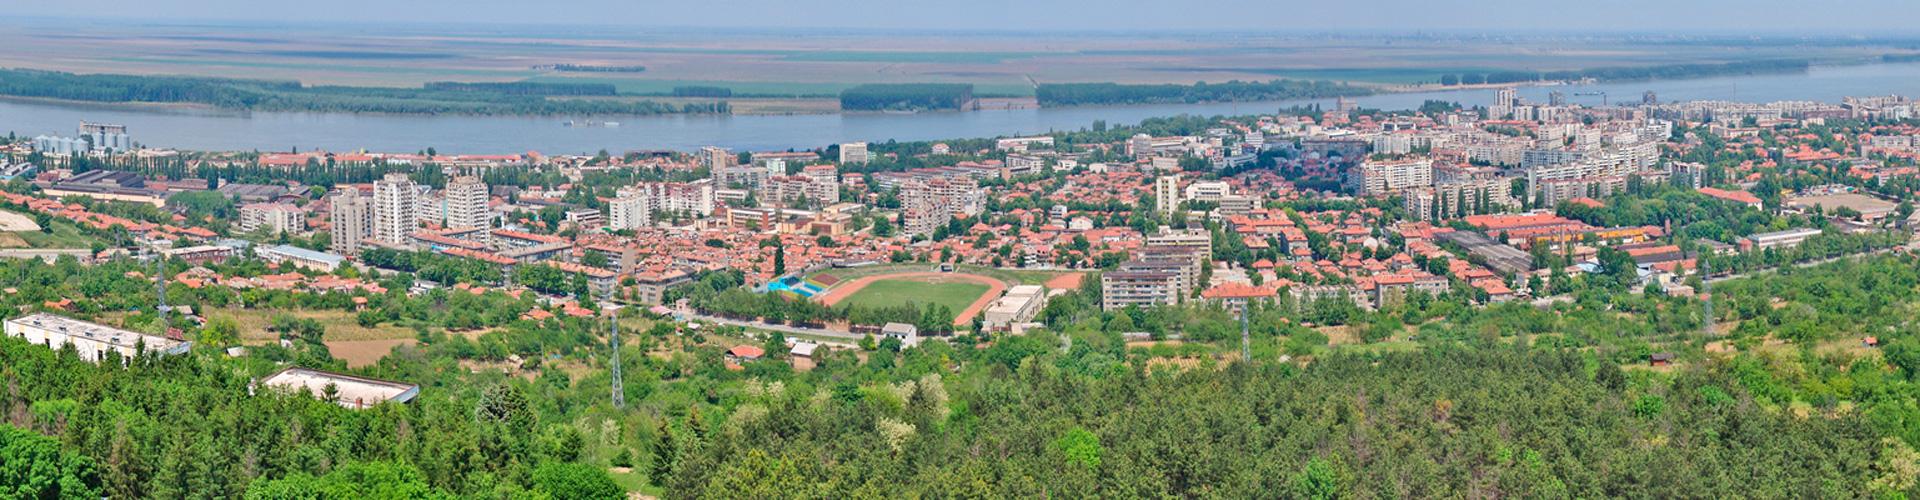 TransferTaxi-EUROPE | Silistra-Panorama1 - TransferTaxi-EUROPE